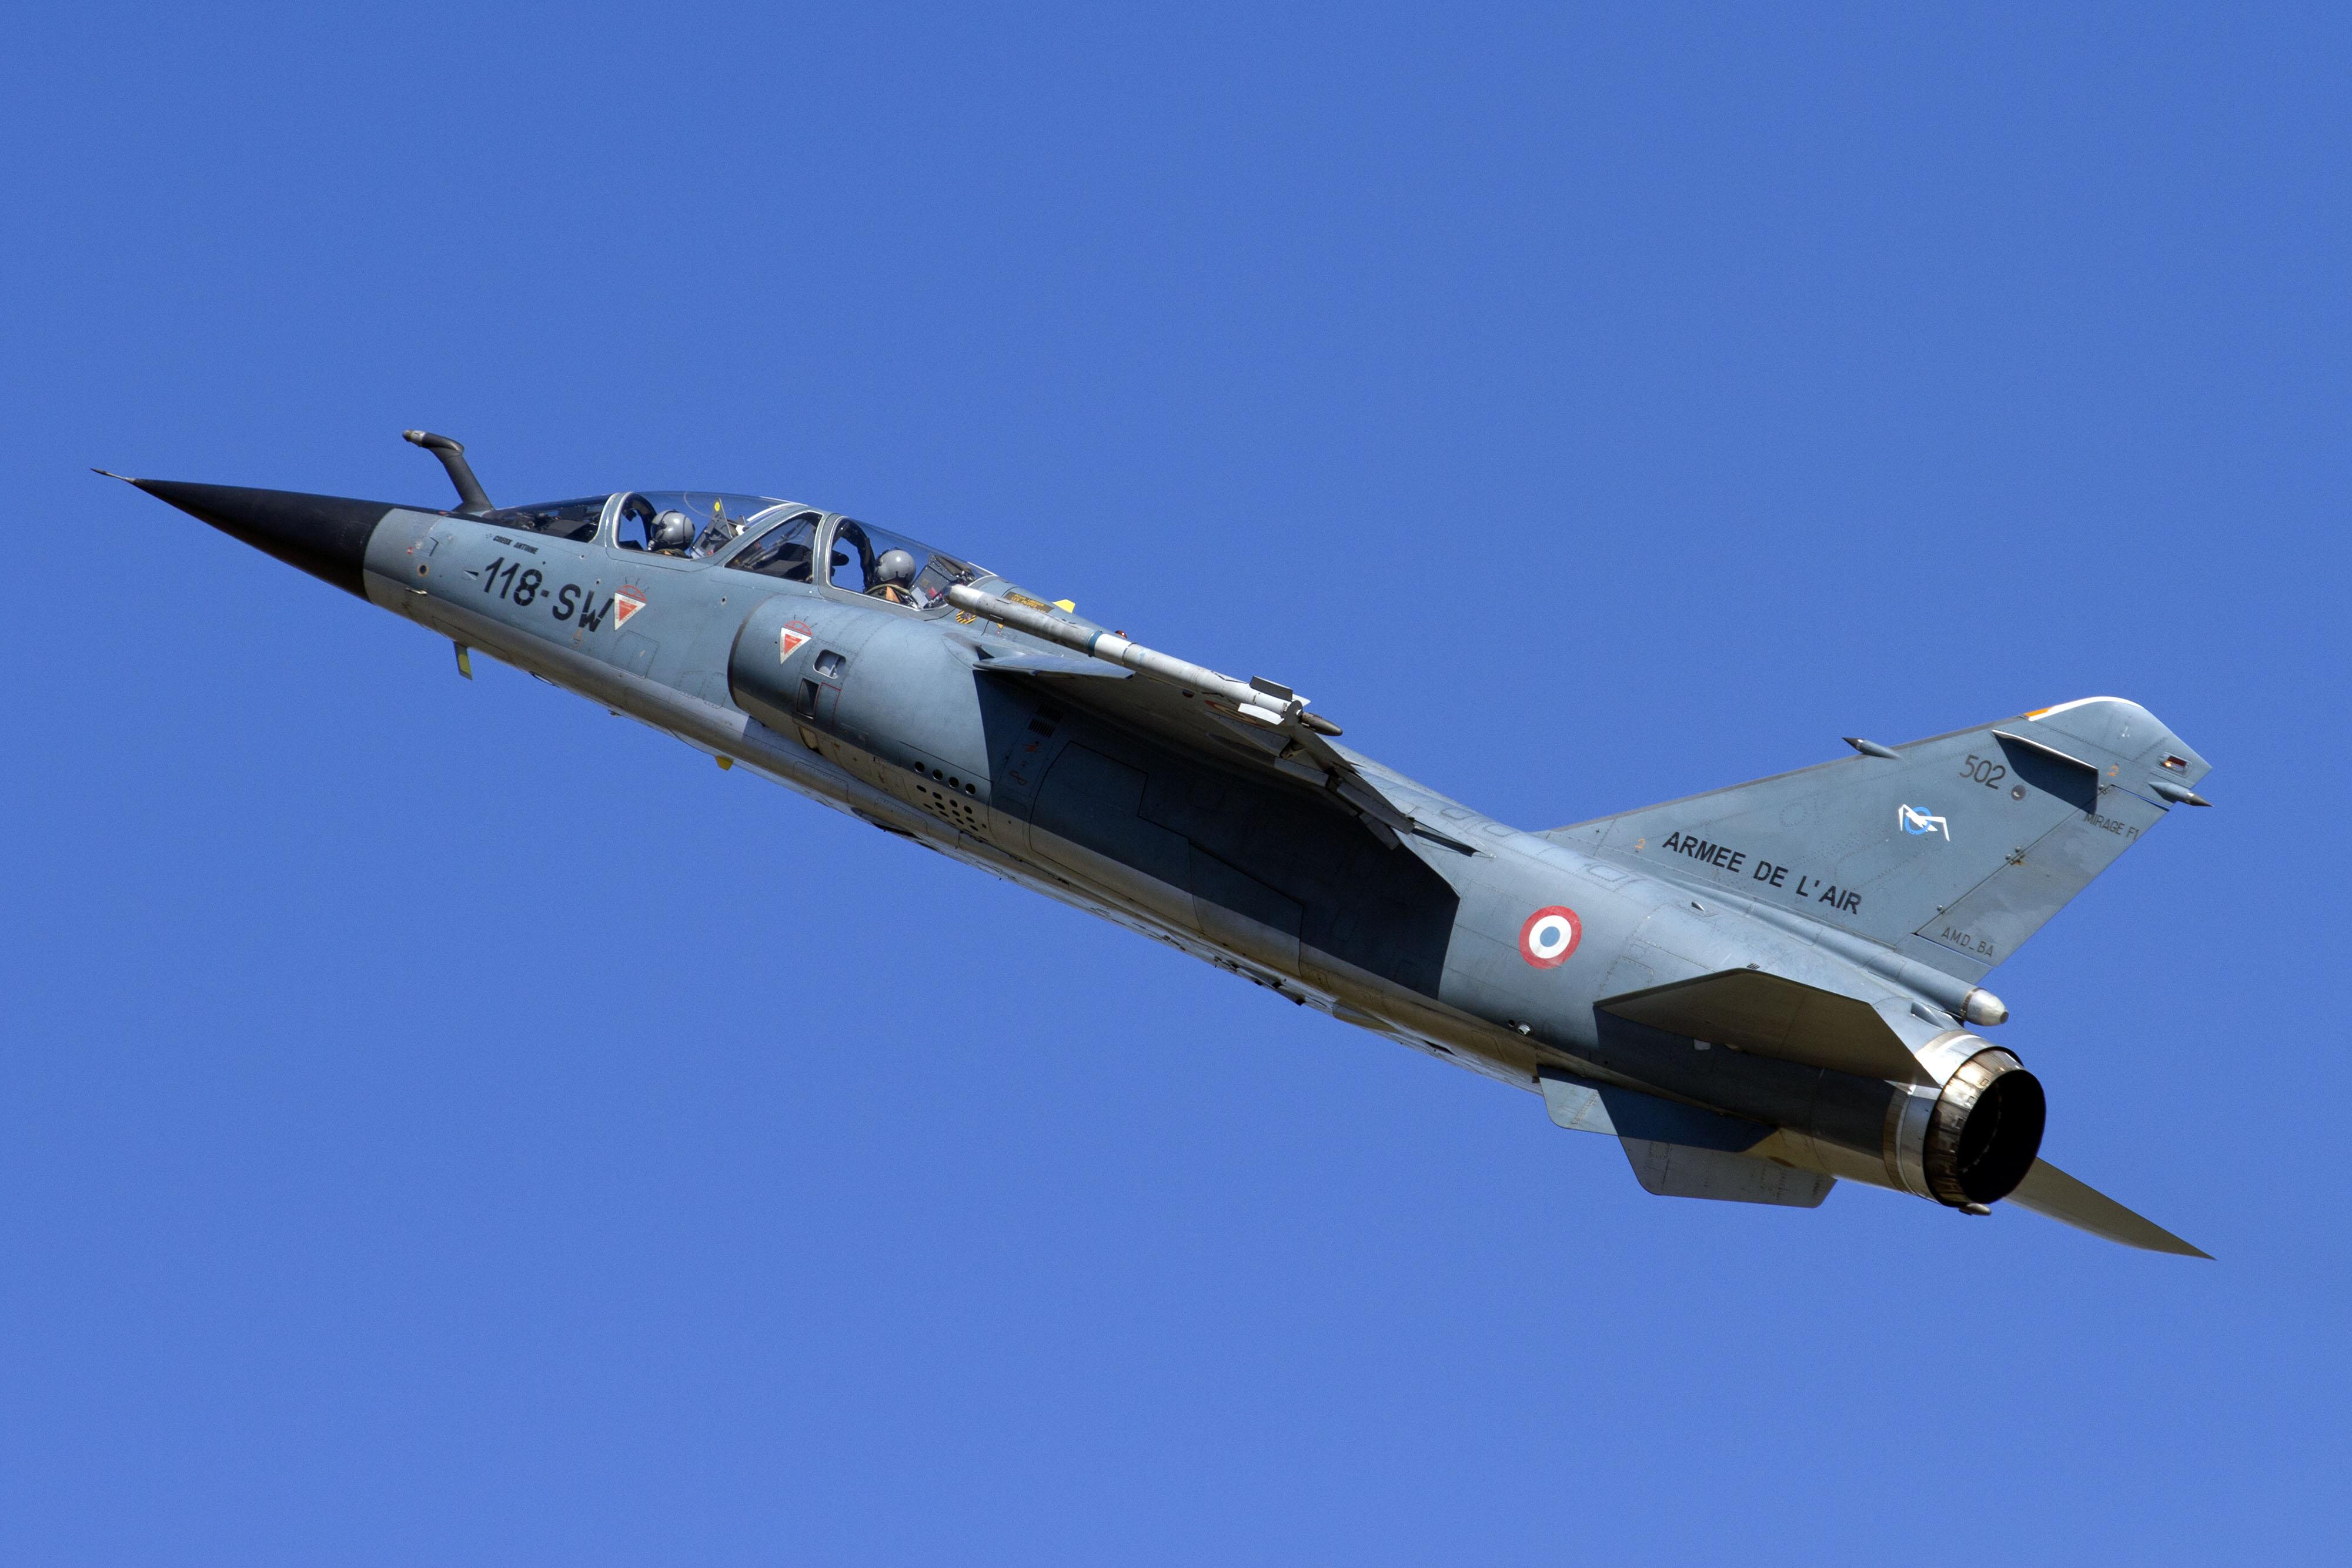 Mirage F1 France